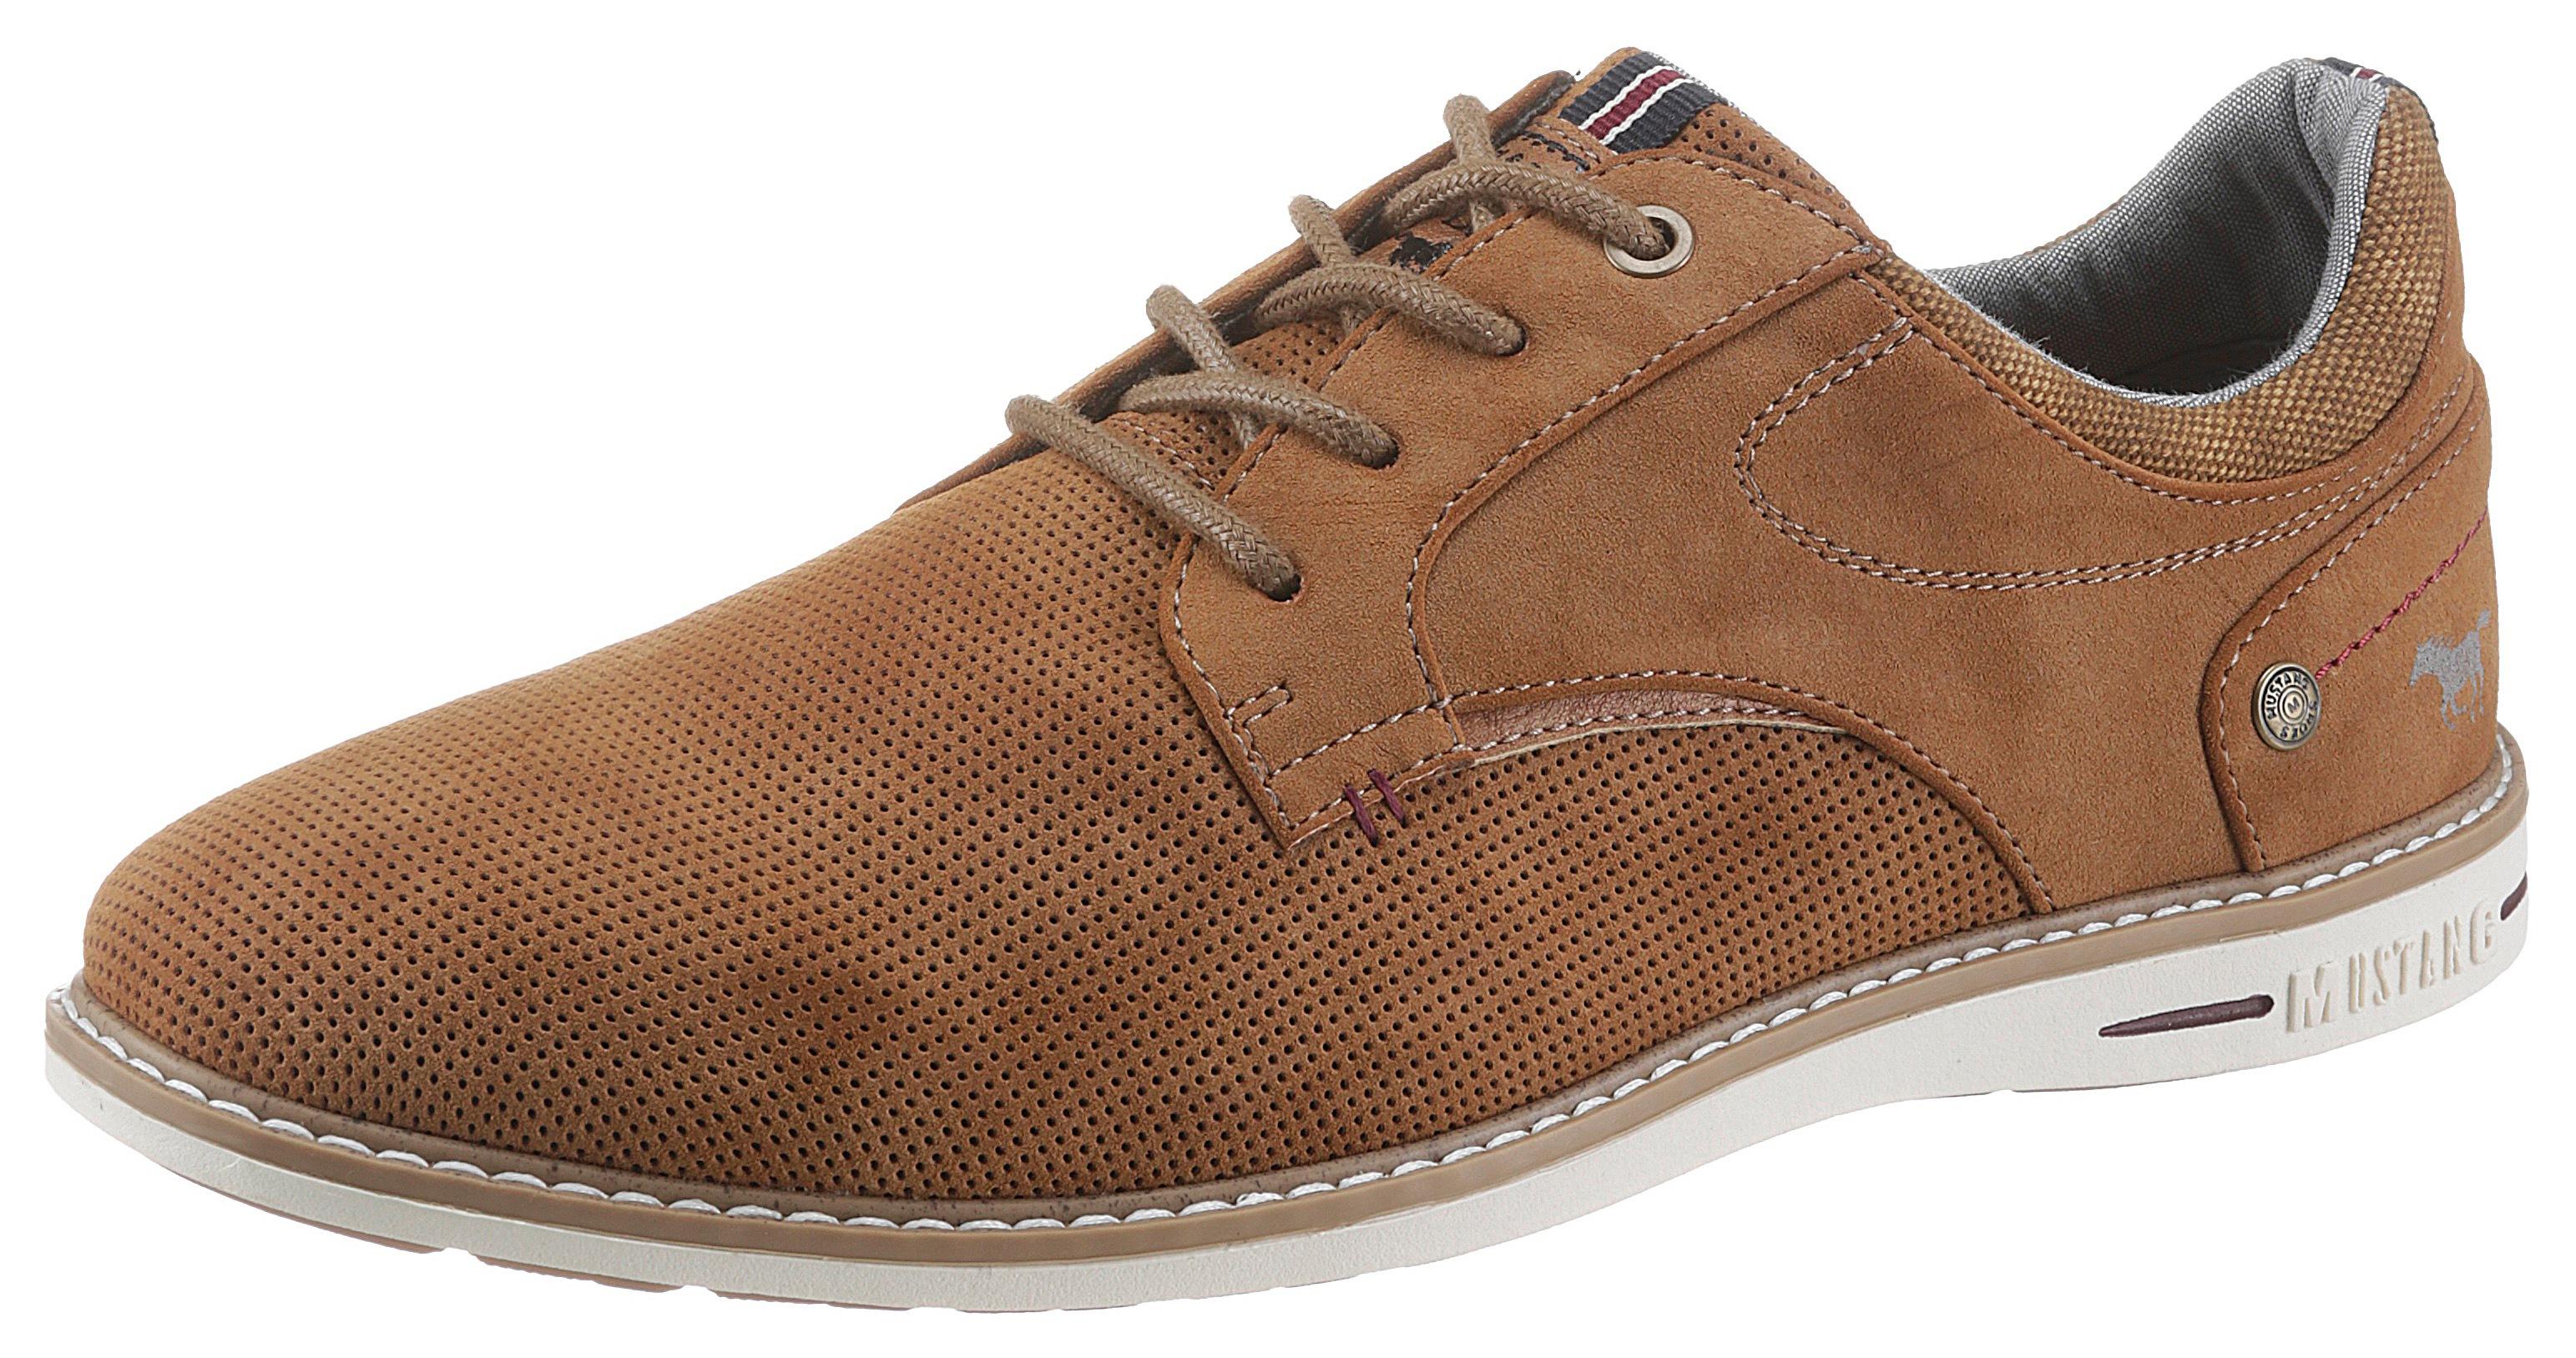 mustang shoes -  Schnürschuh, mit gepolstertem Schaftrand